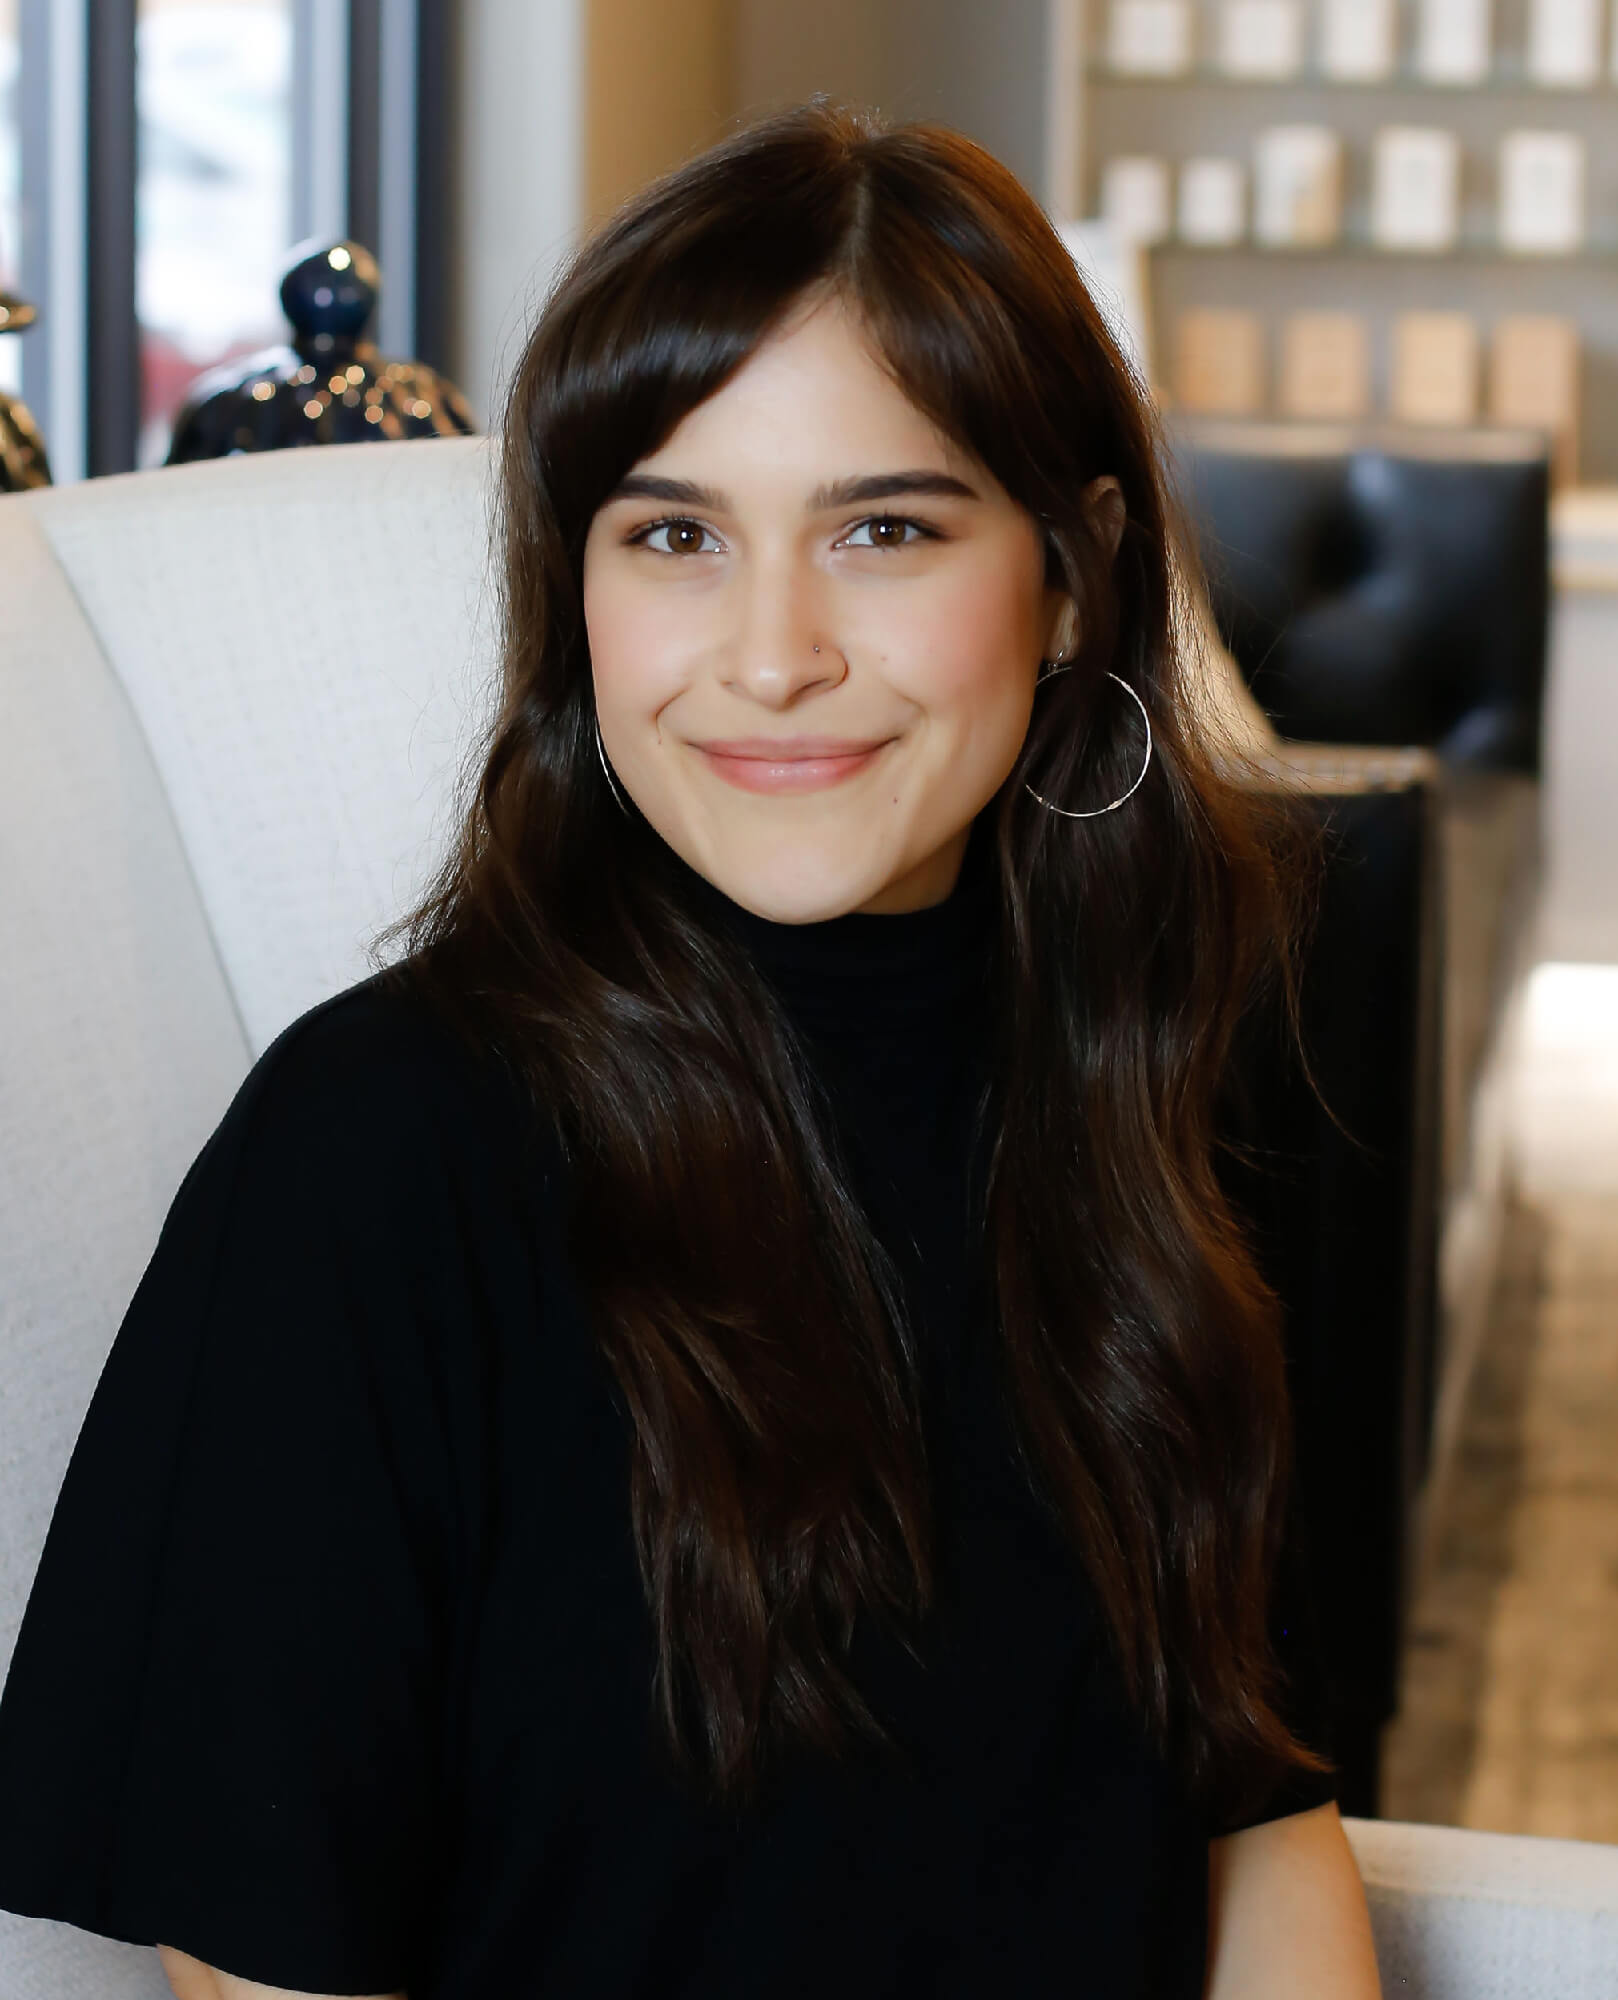 Gloria Rubio Emerge staff photo